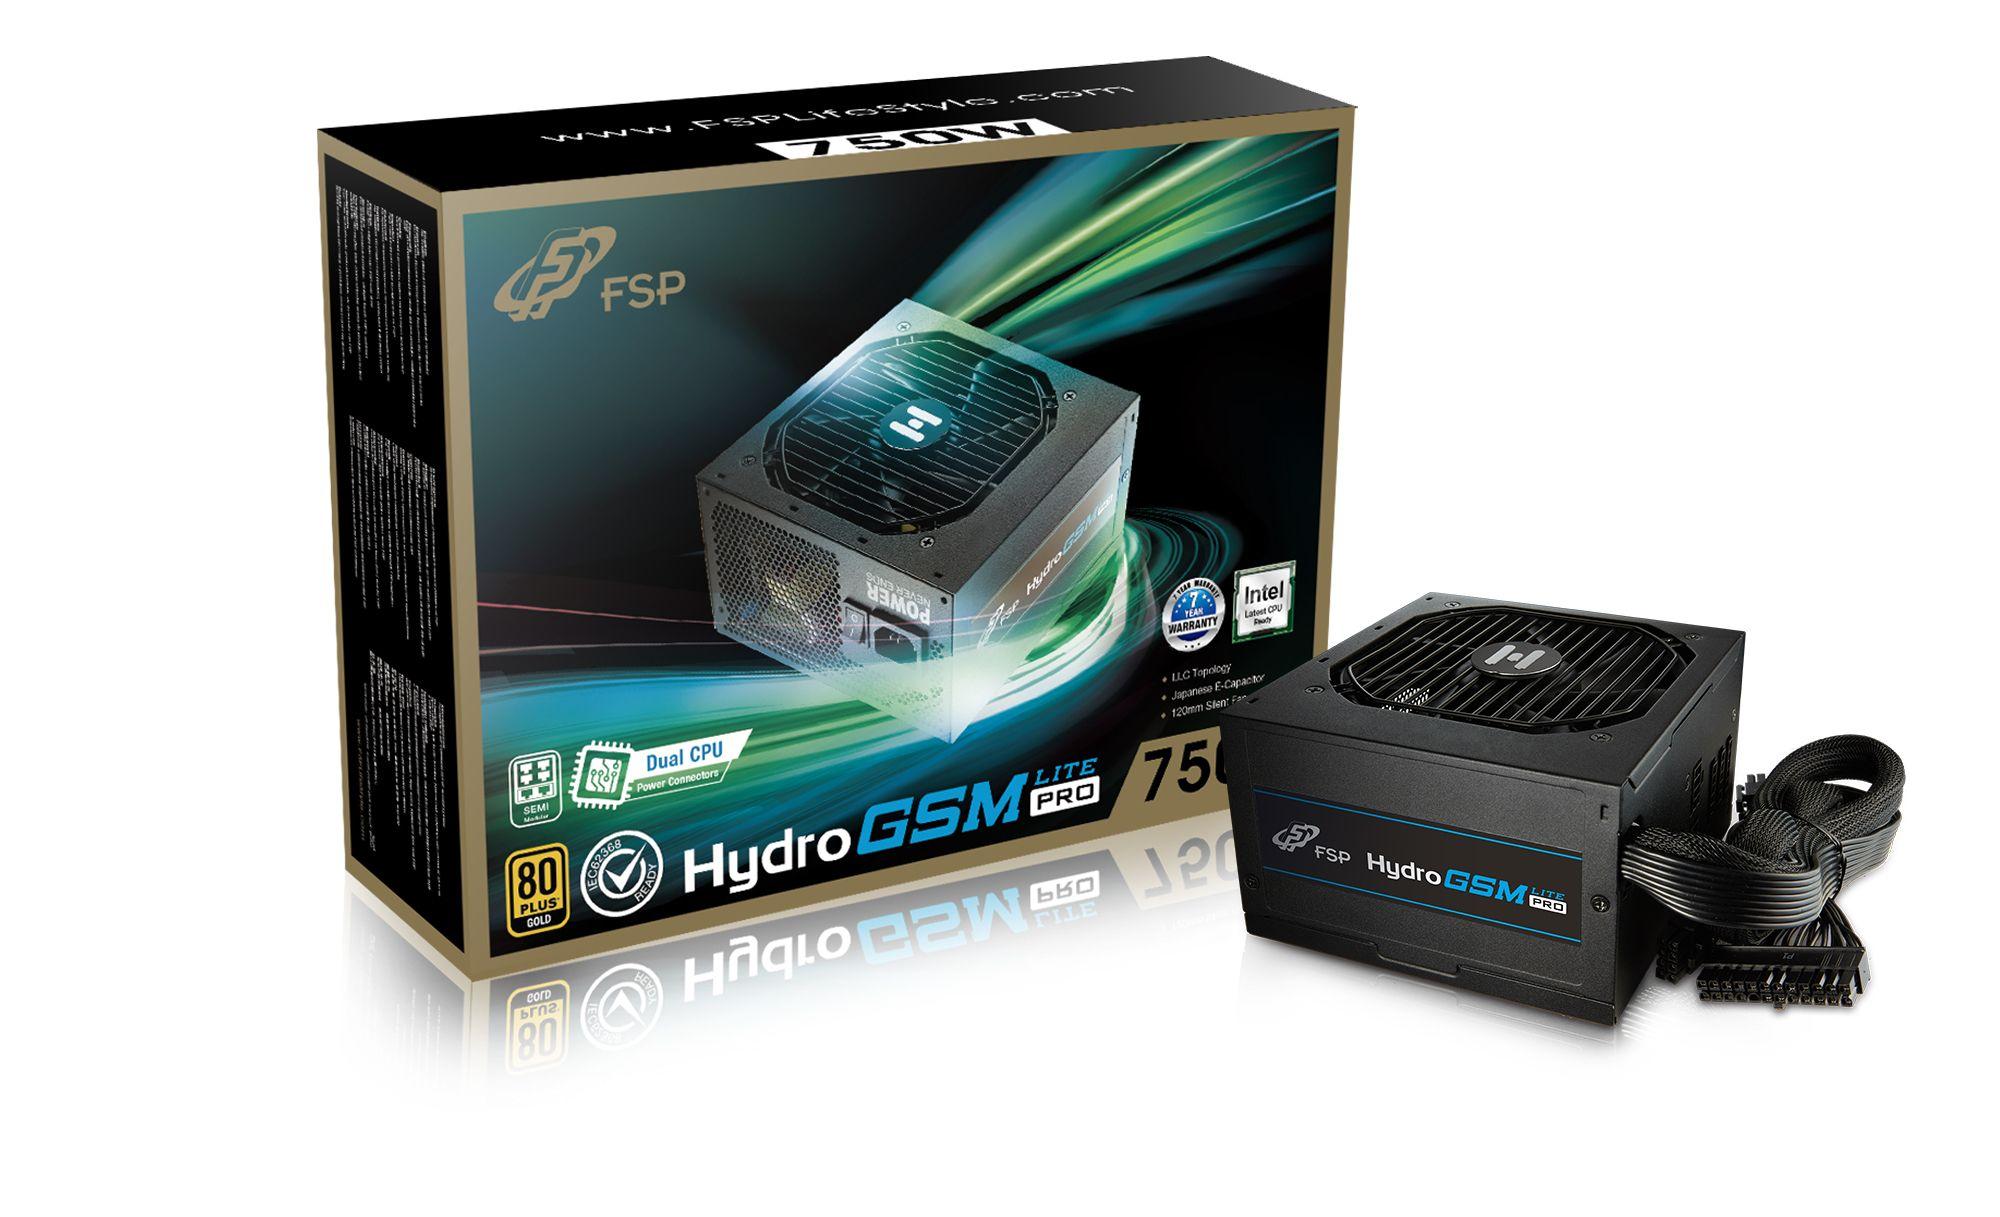 FSP/Fortron HYDRO GSM Lite PRO 750, 80PLUS GOLD, 750W, semi-modular - PPA7506101